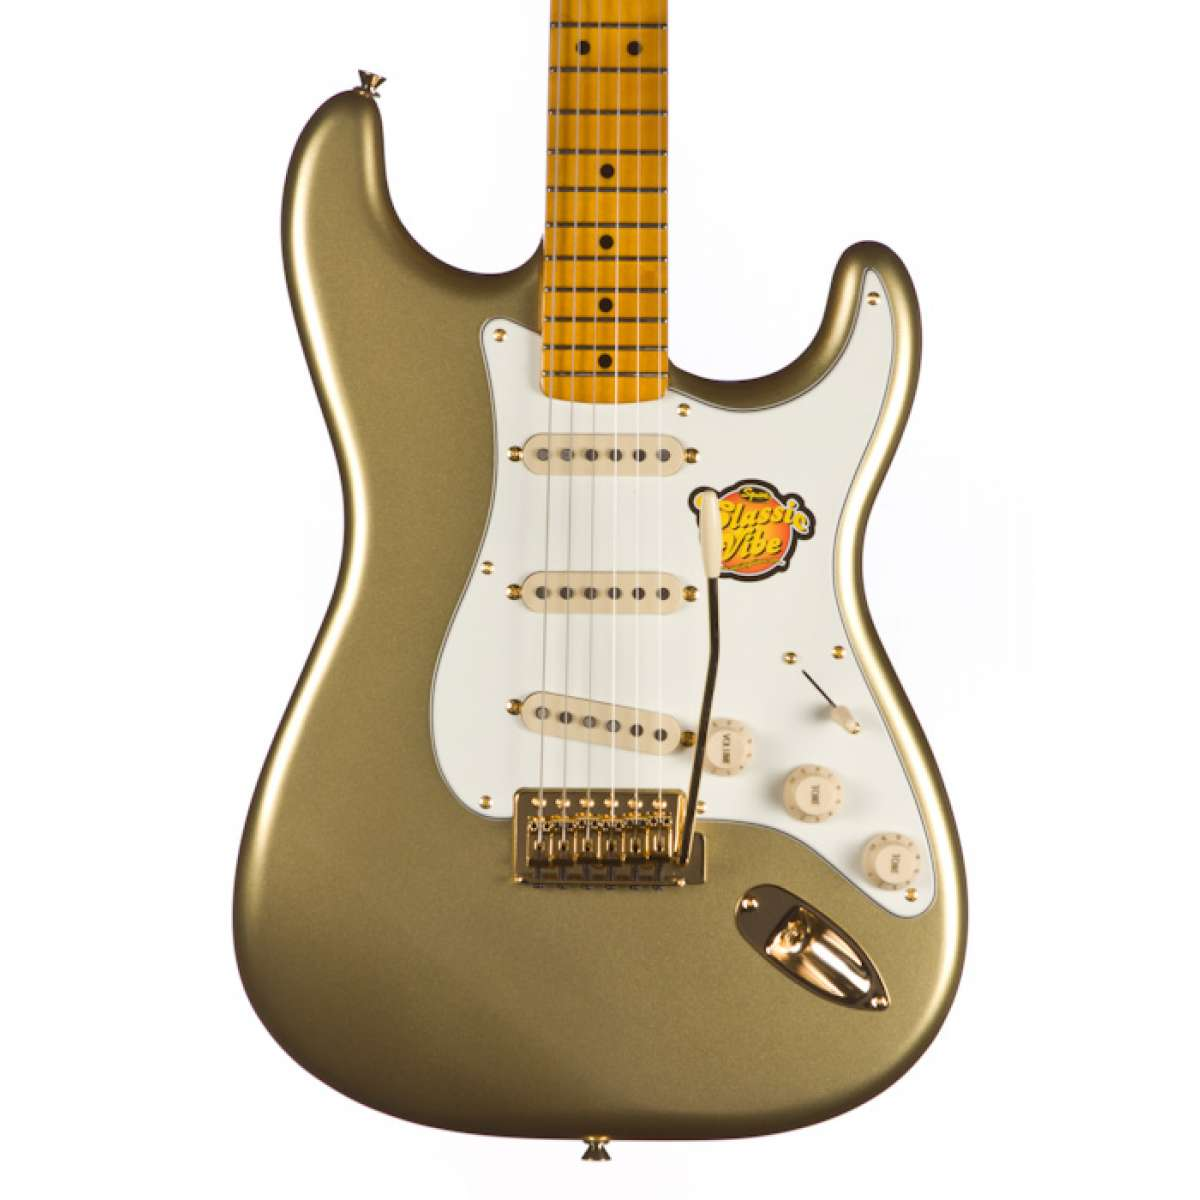 Guitarra Fender Squier Classic Vibe Strato 60TH Anniversary AZTEC Gold + Gig Bag Fender Squier.